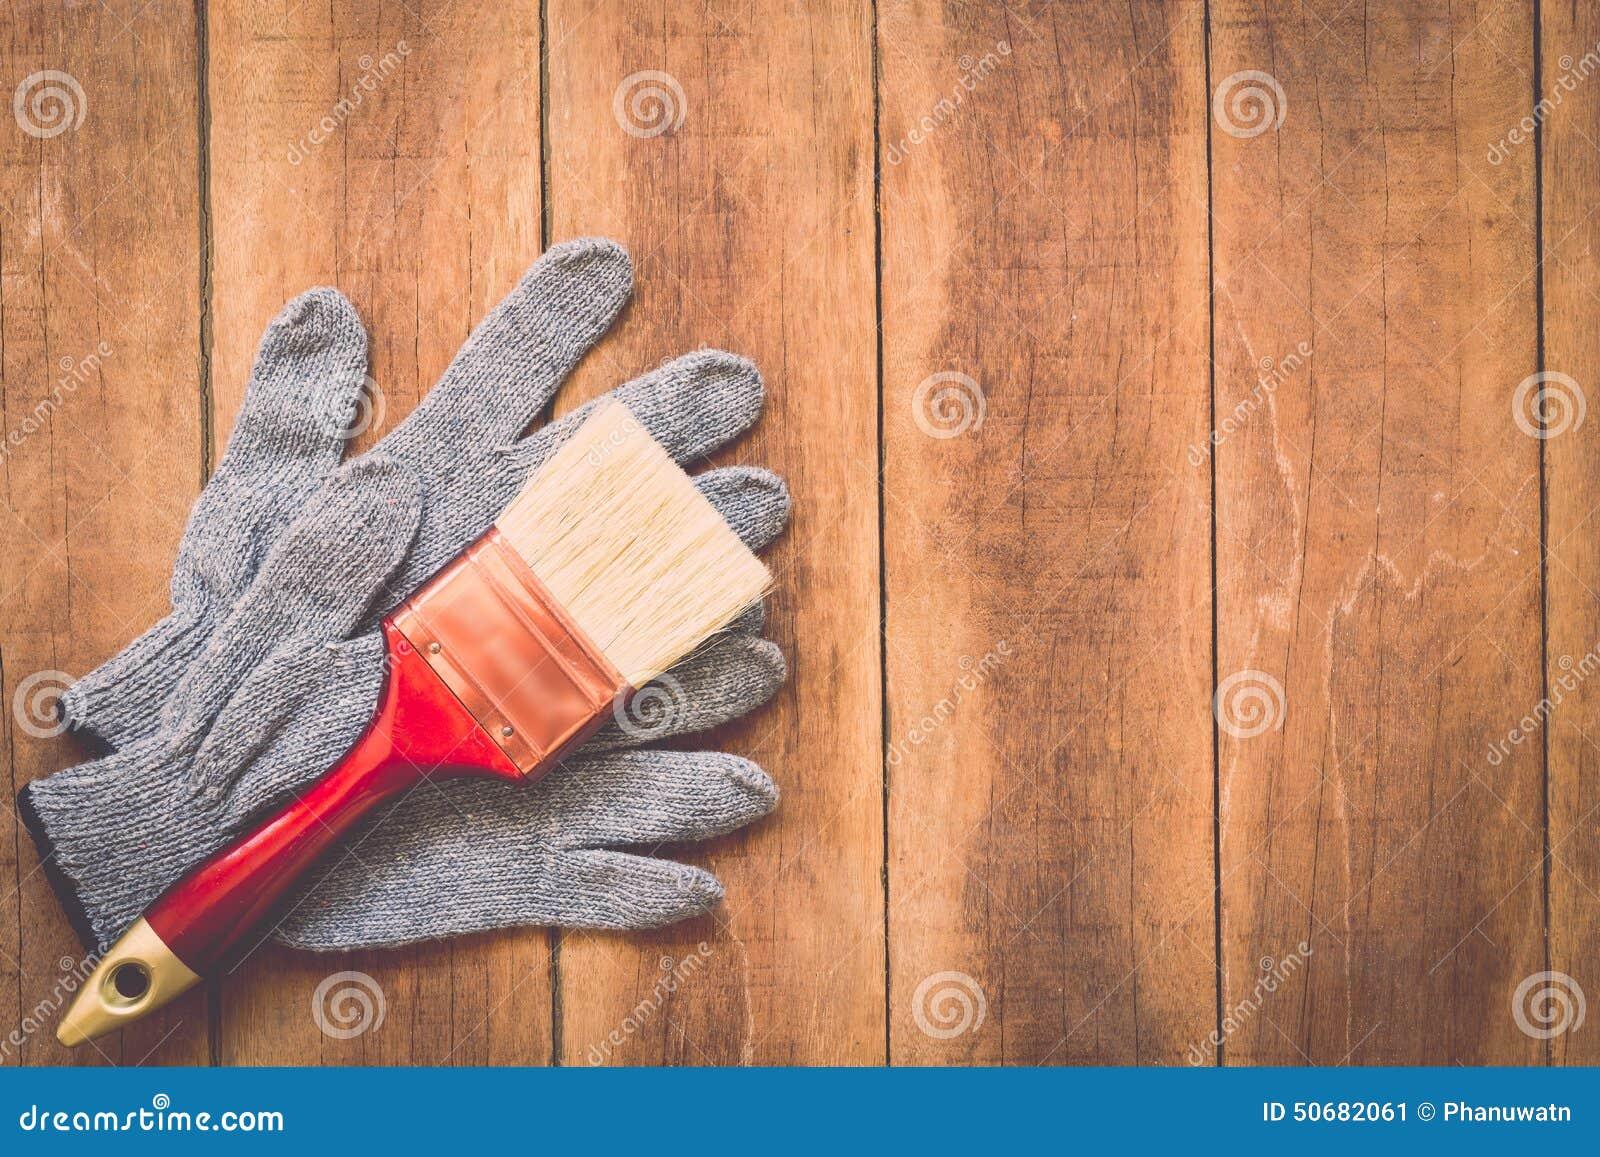 Download 在木头的被分类的工作工具 库存图片. 图片 包括有 楼层, 盔甲, 地板, 钳子, 背包, 硬件, 建筑 - 50682061